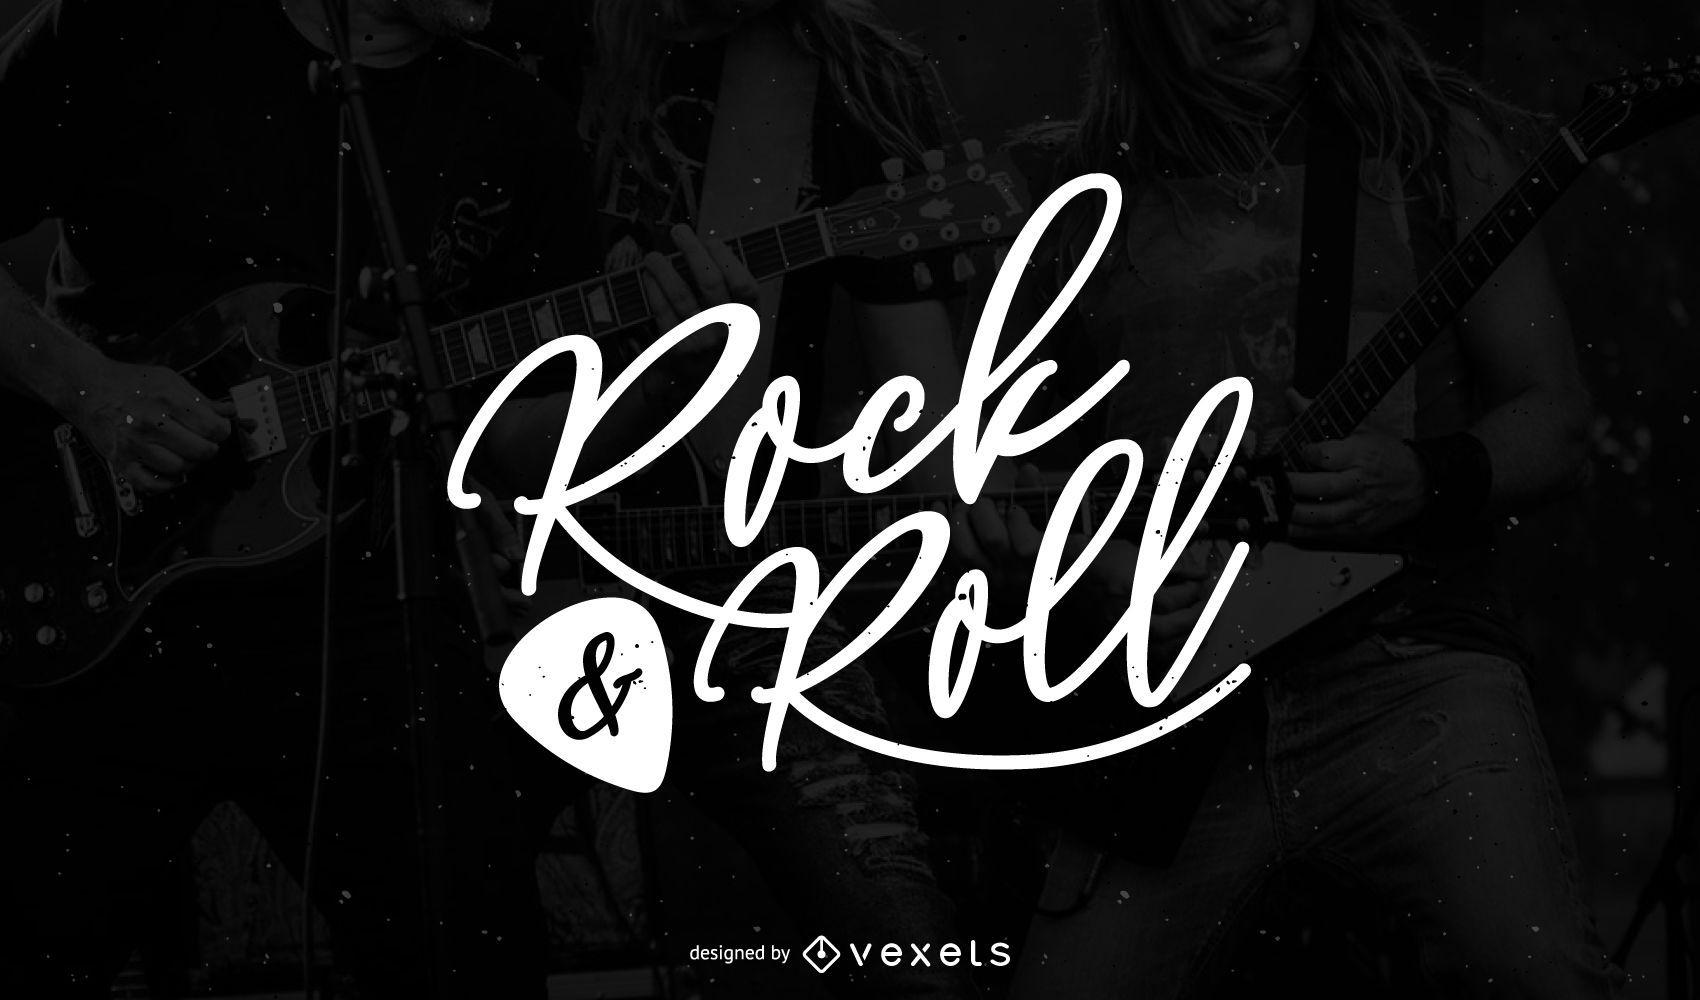 Dise?o de plantilla de logotipo de rock and roll